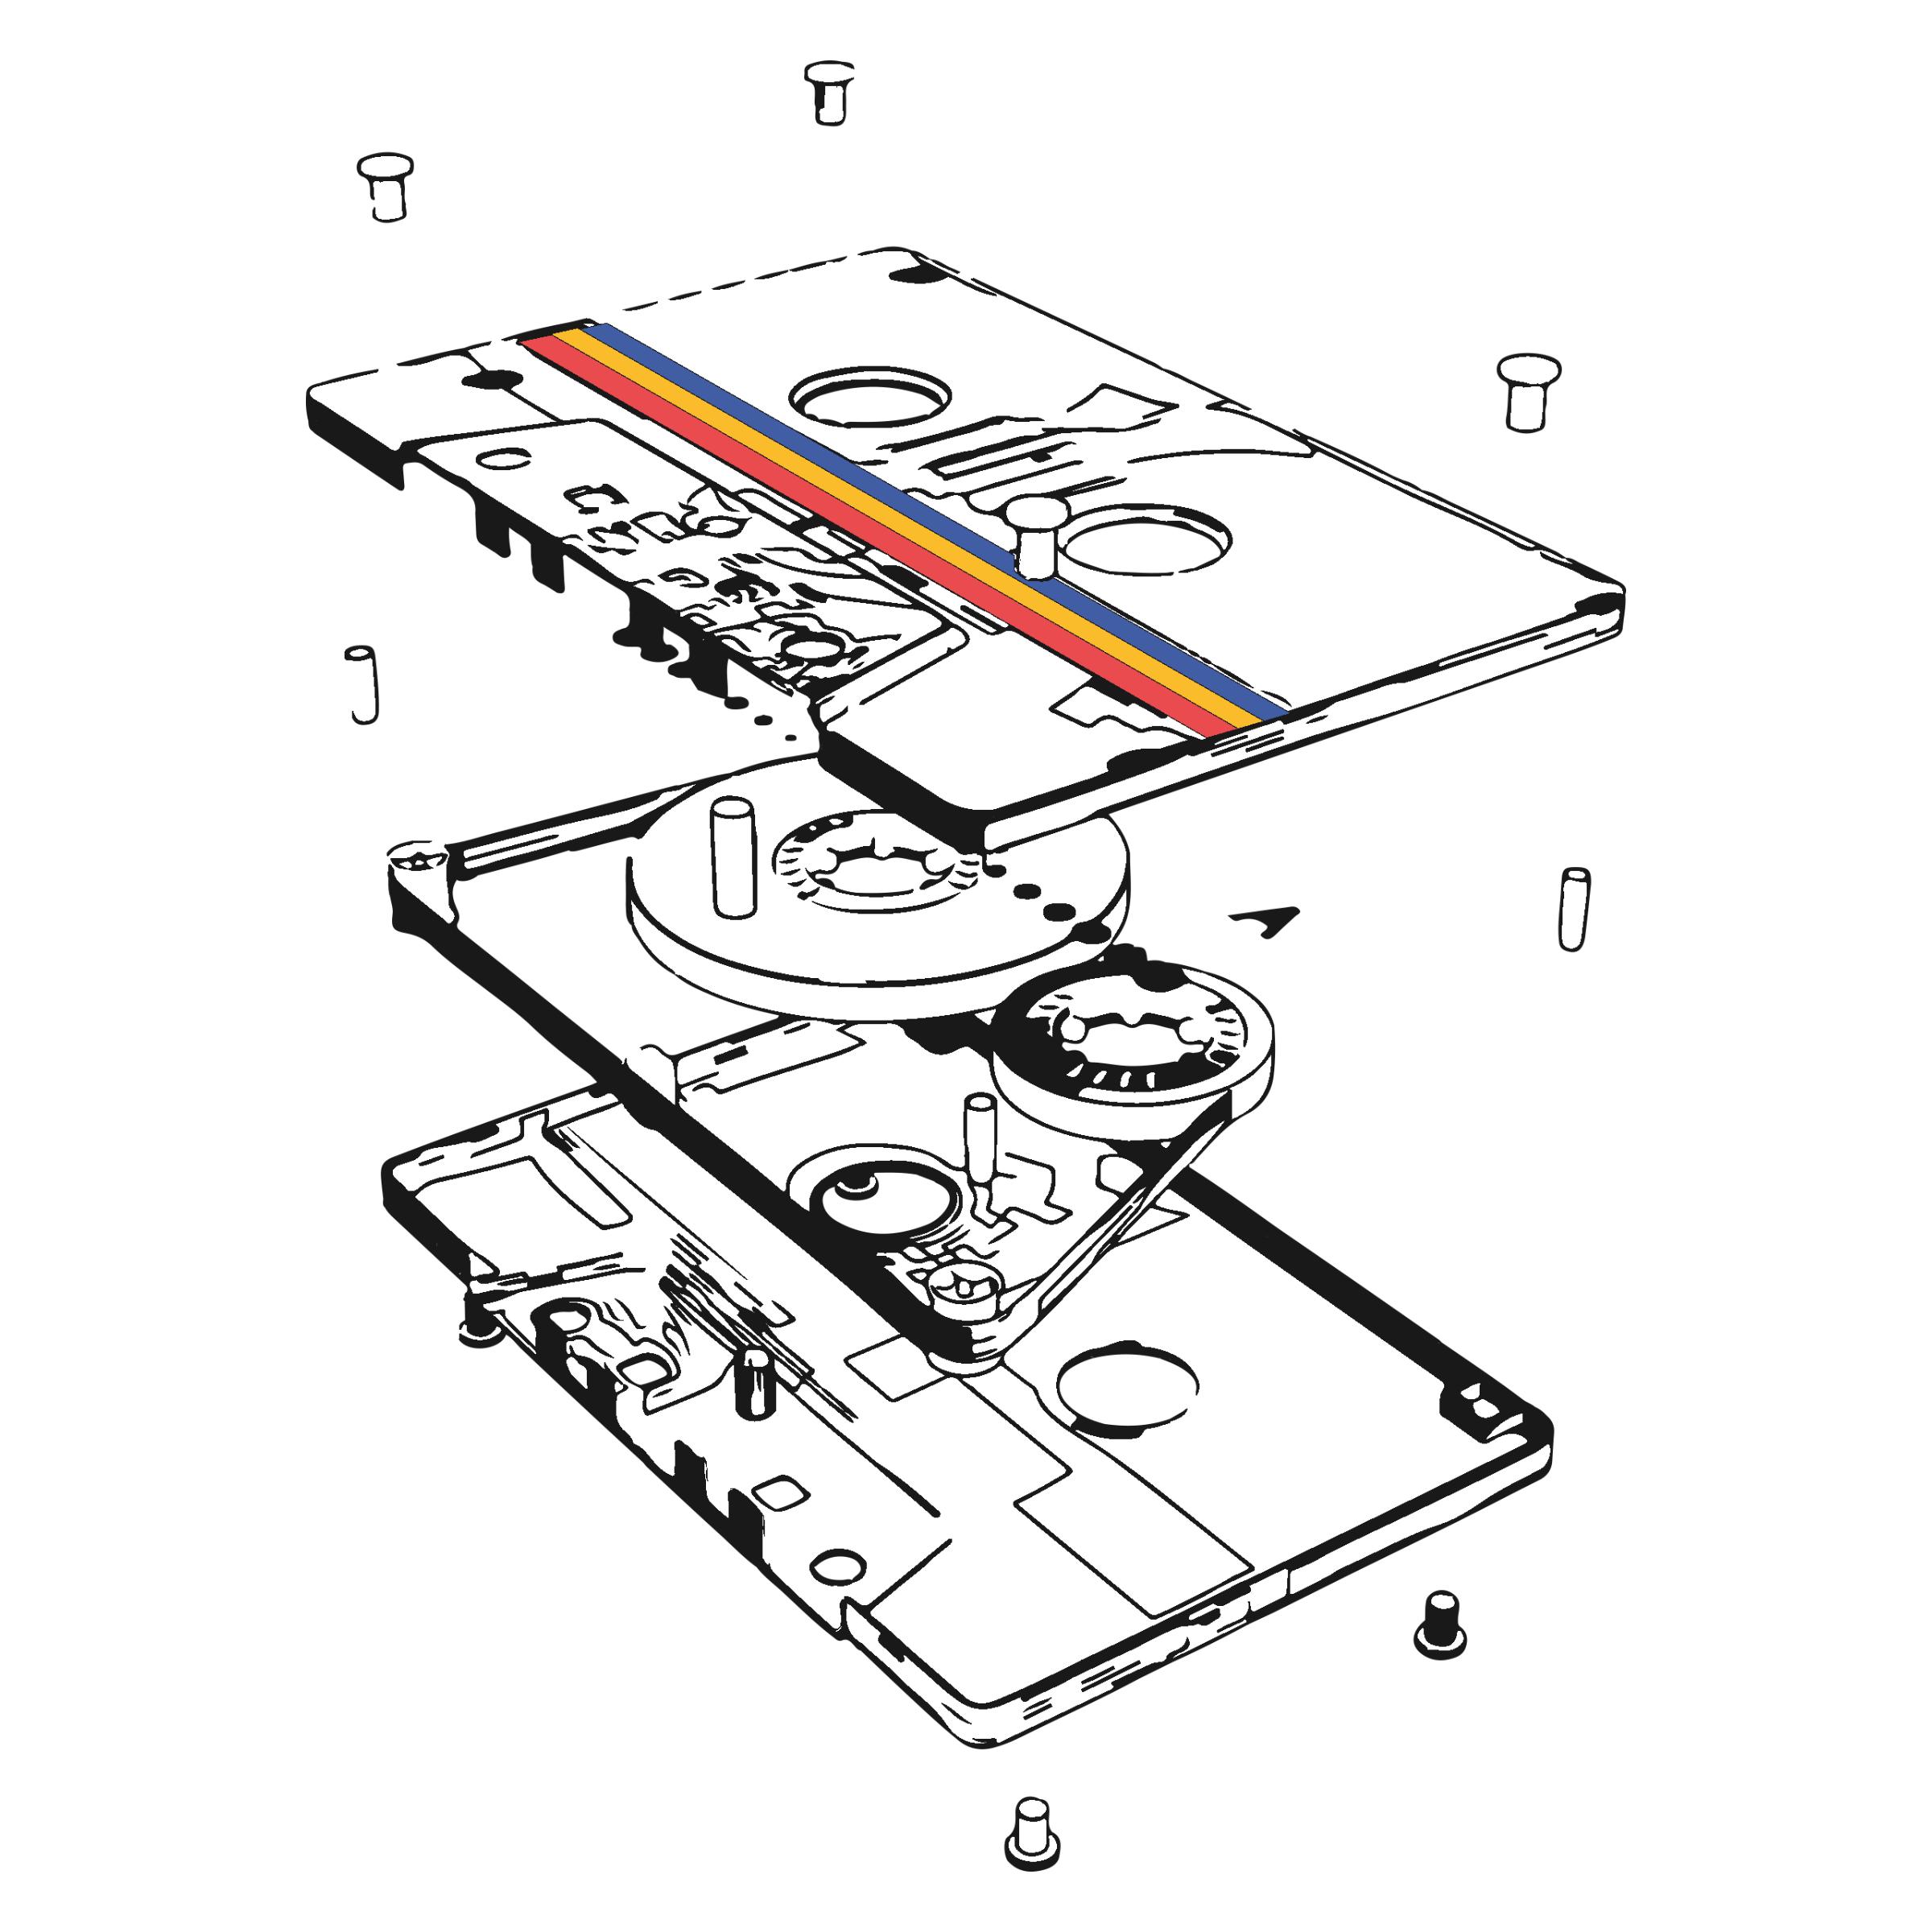 The Cassette